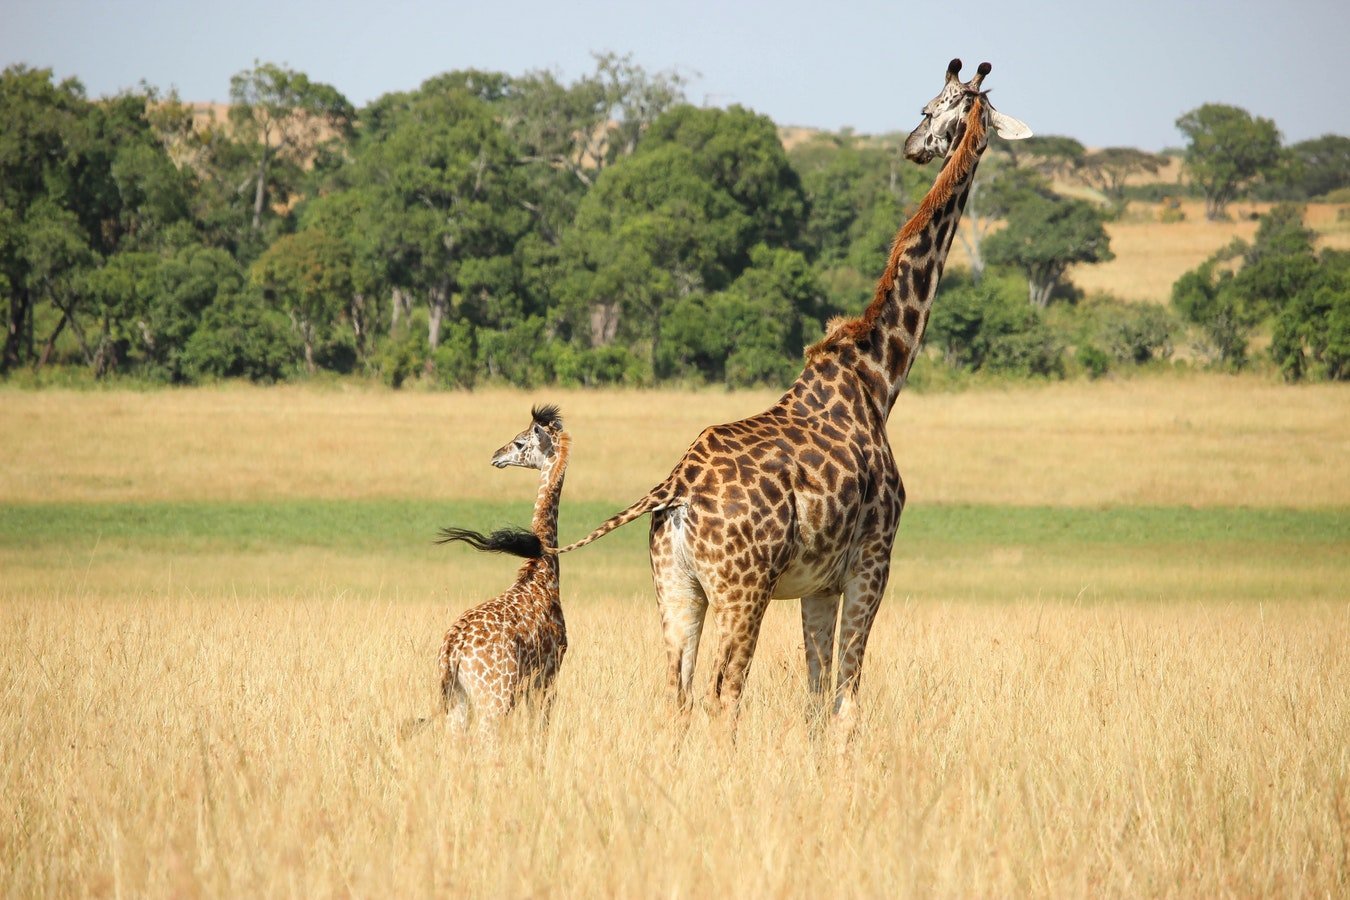 Arusha_national_park_safari.jpeg - description